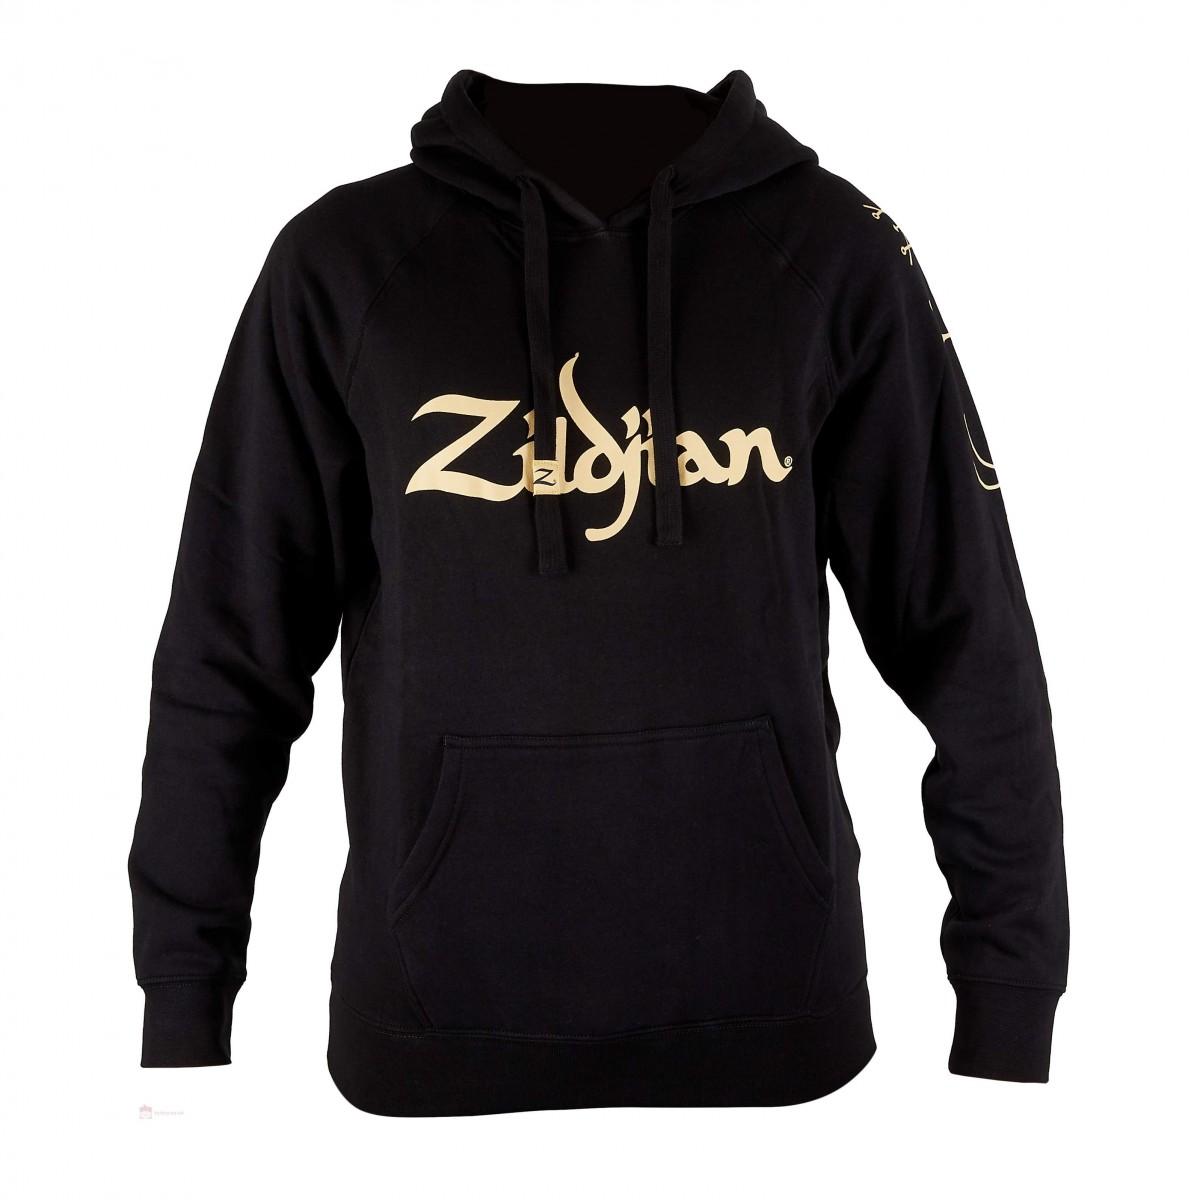 Zildjian Alchemy Pullover Hoodie, Medium